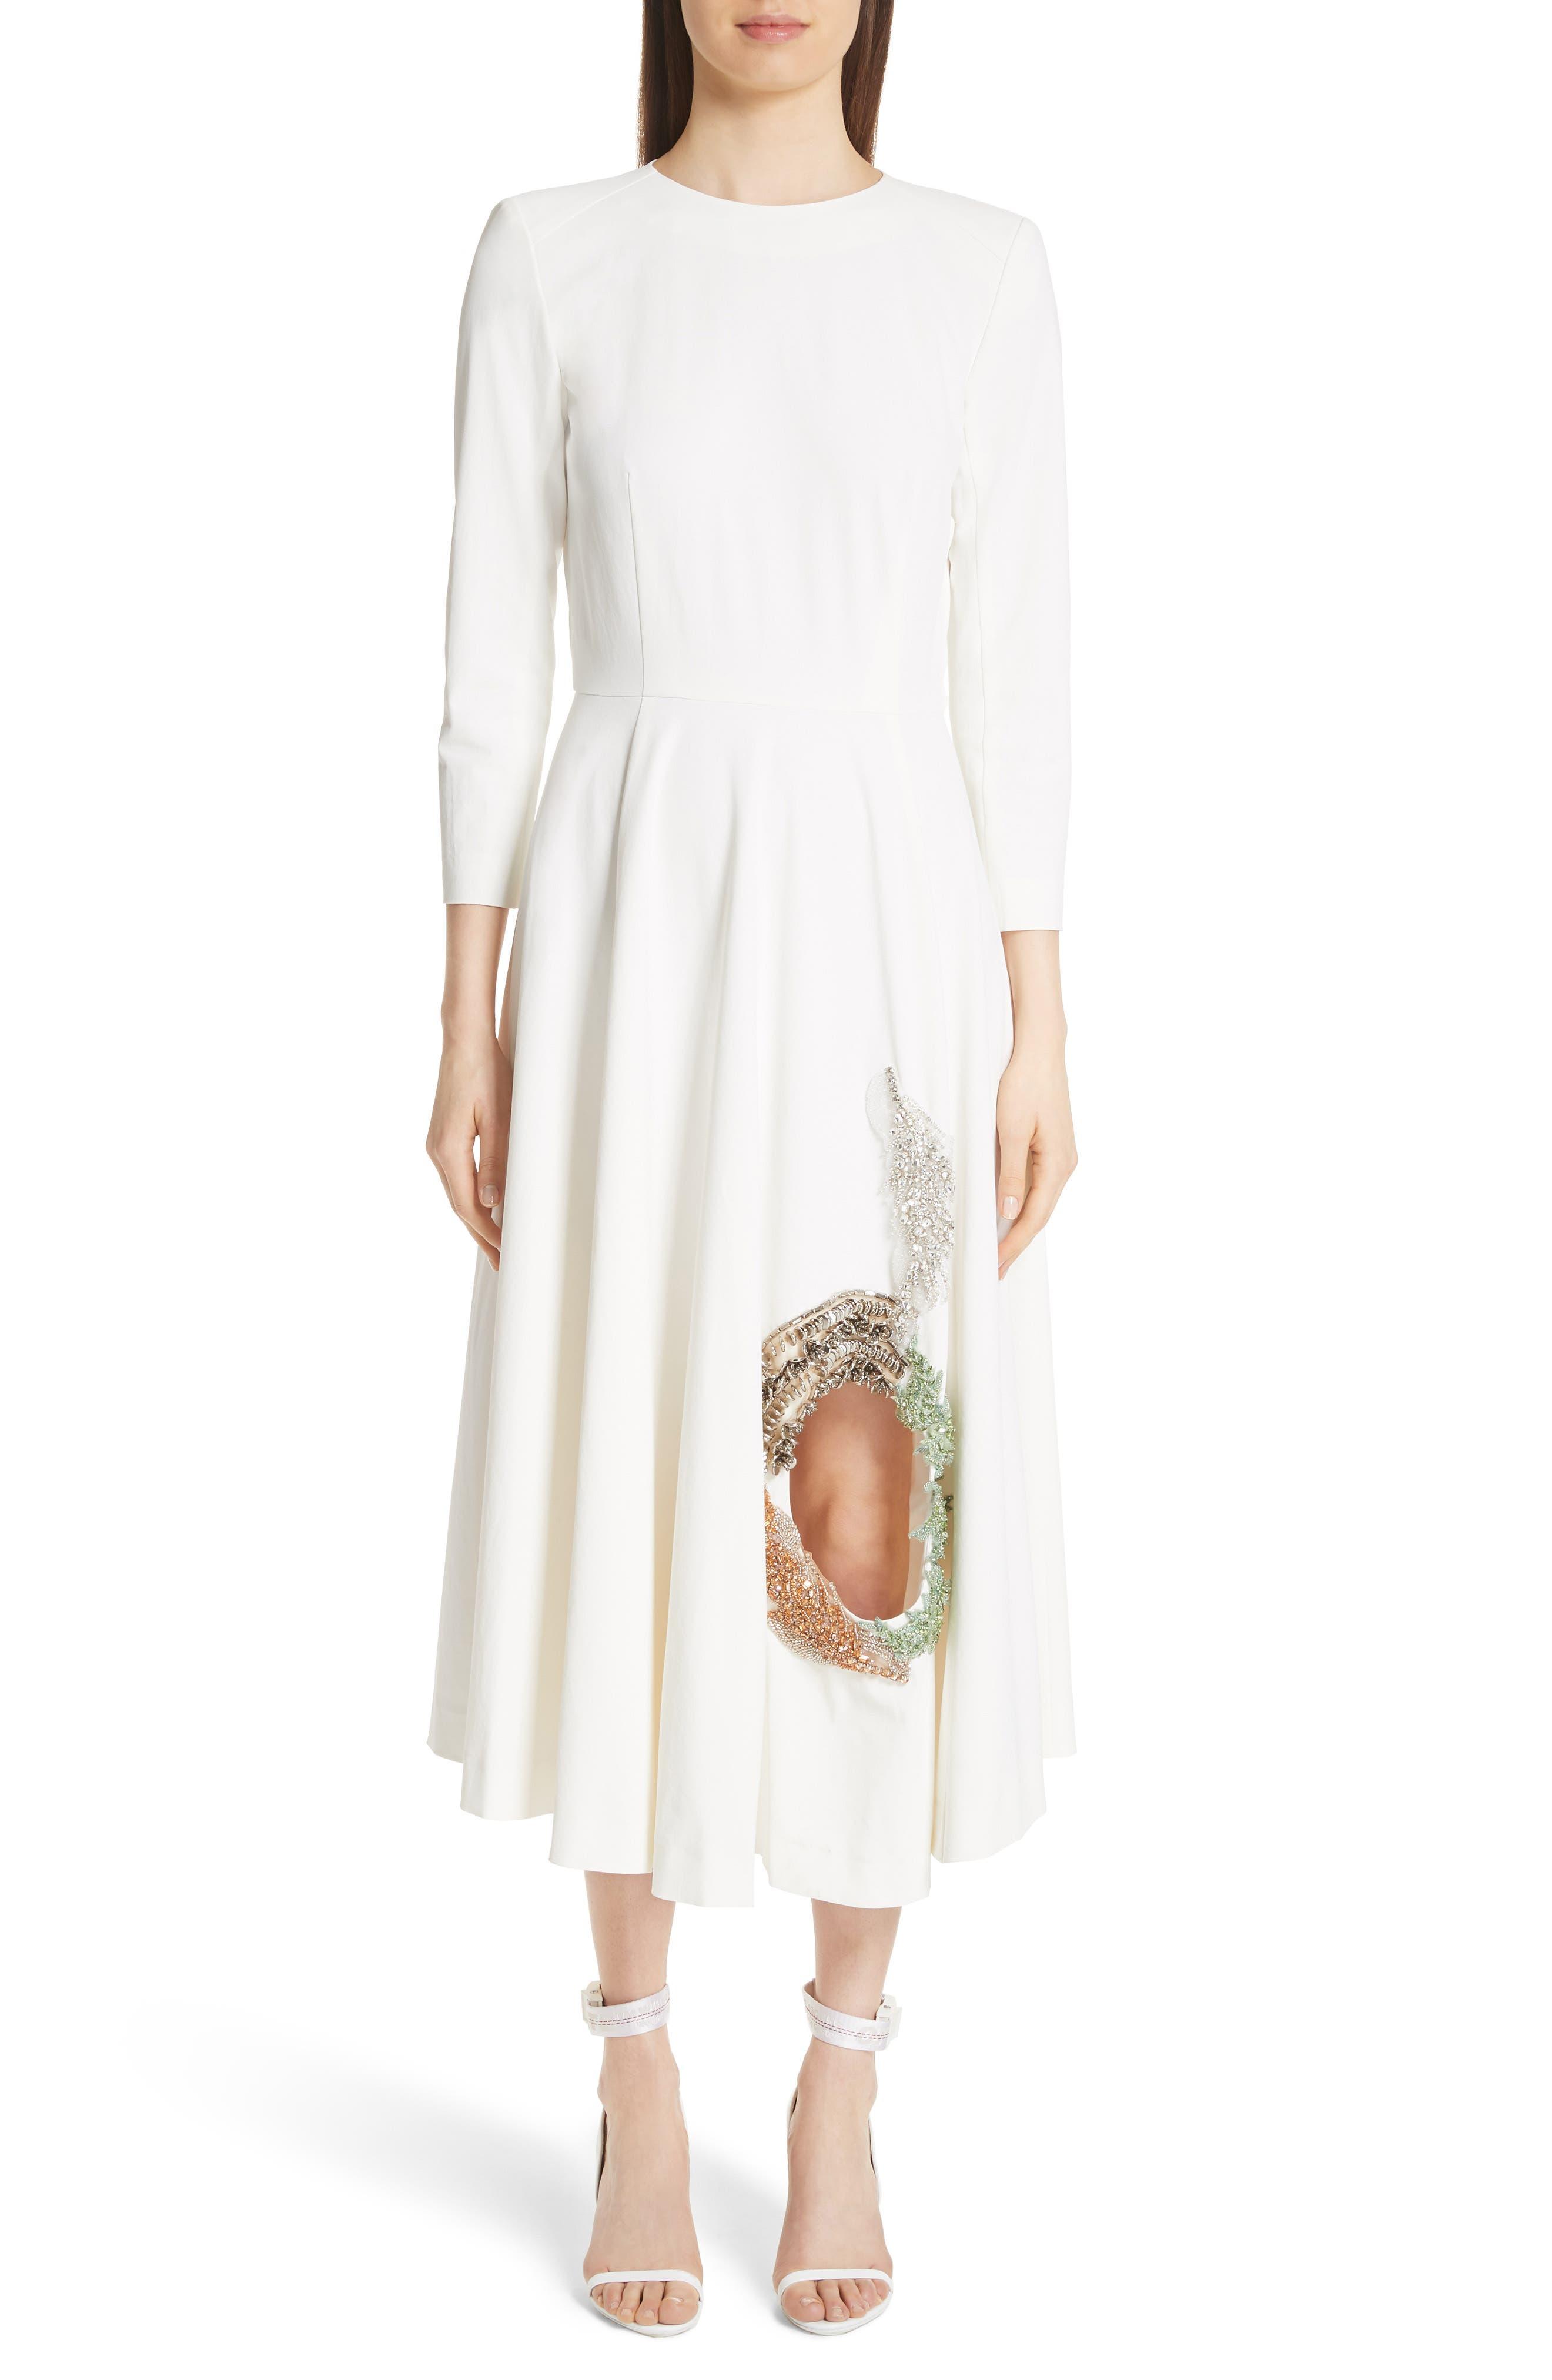 TOGA Beaded Keyhole Dress, Main, color, 100